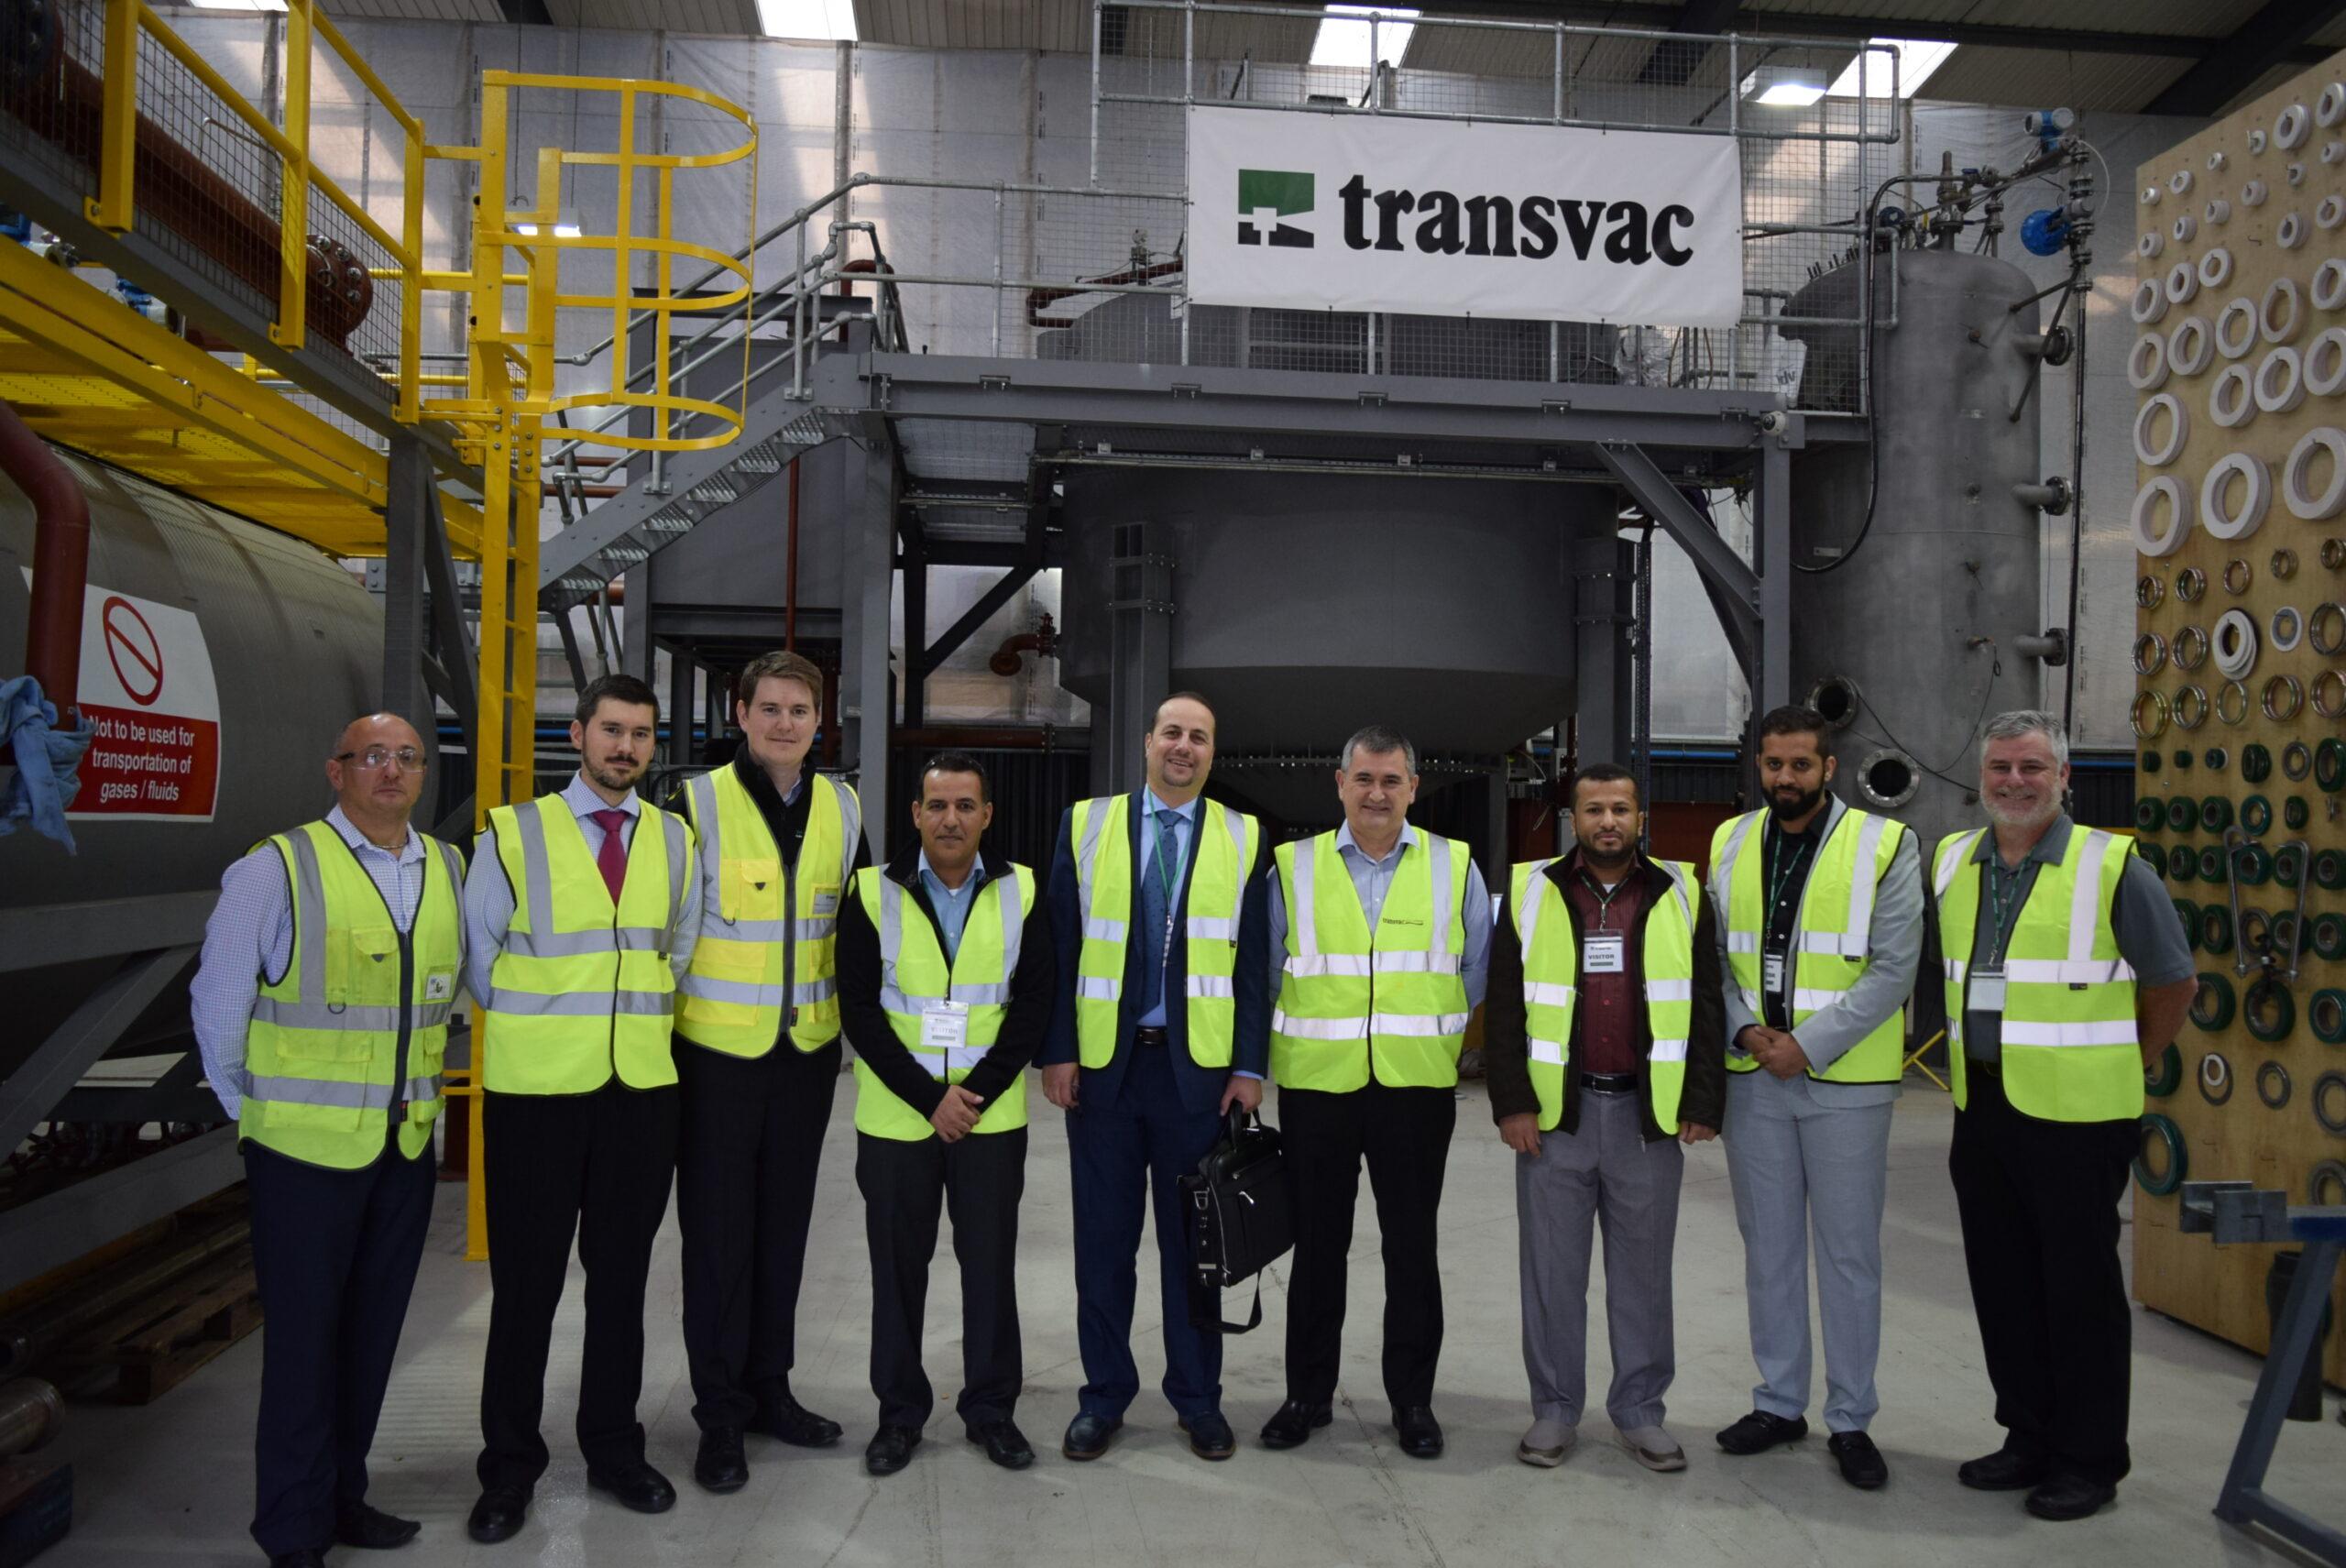 Saudi Aramco Team at Transvac's Test Facility